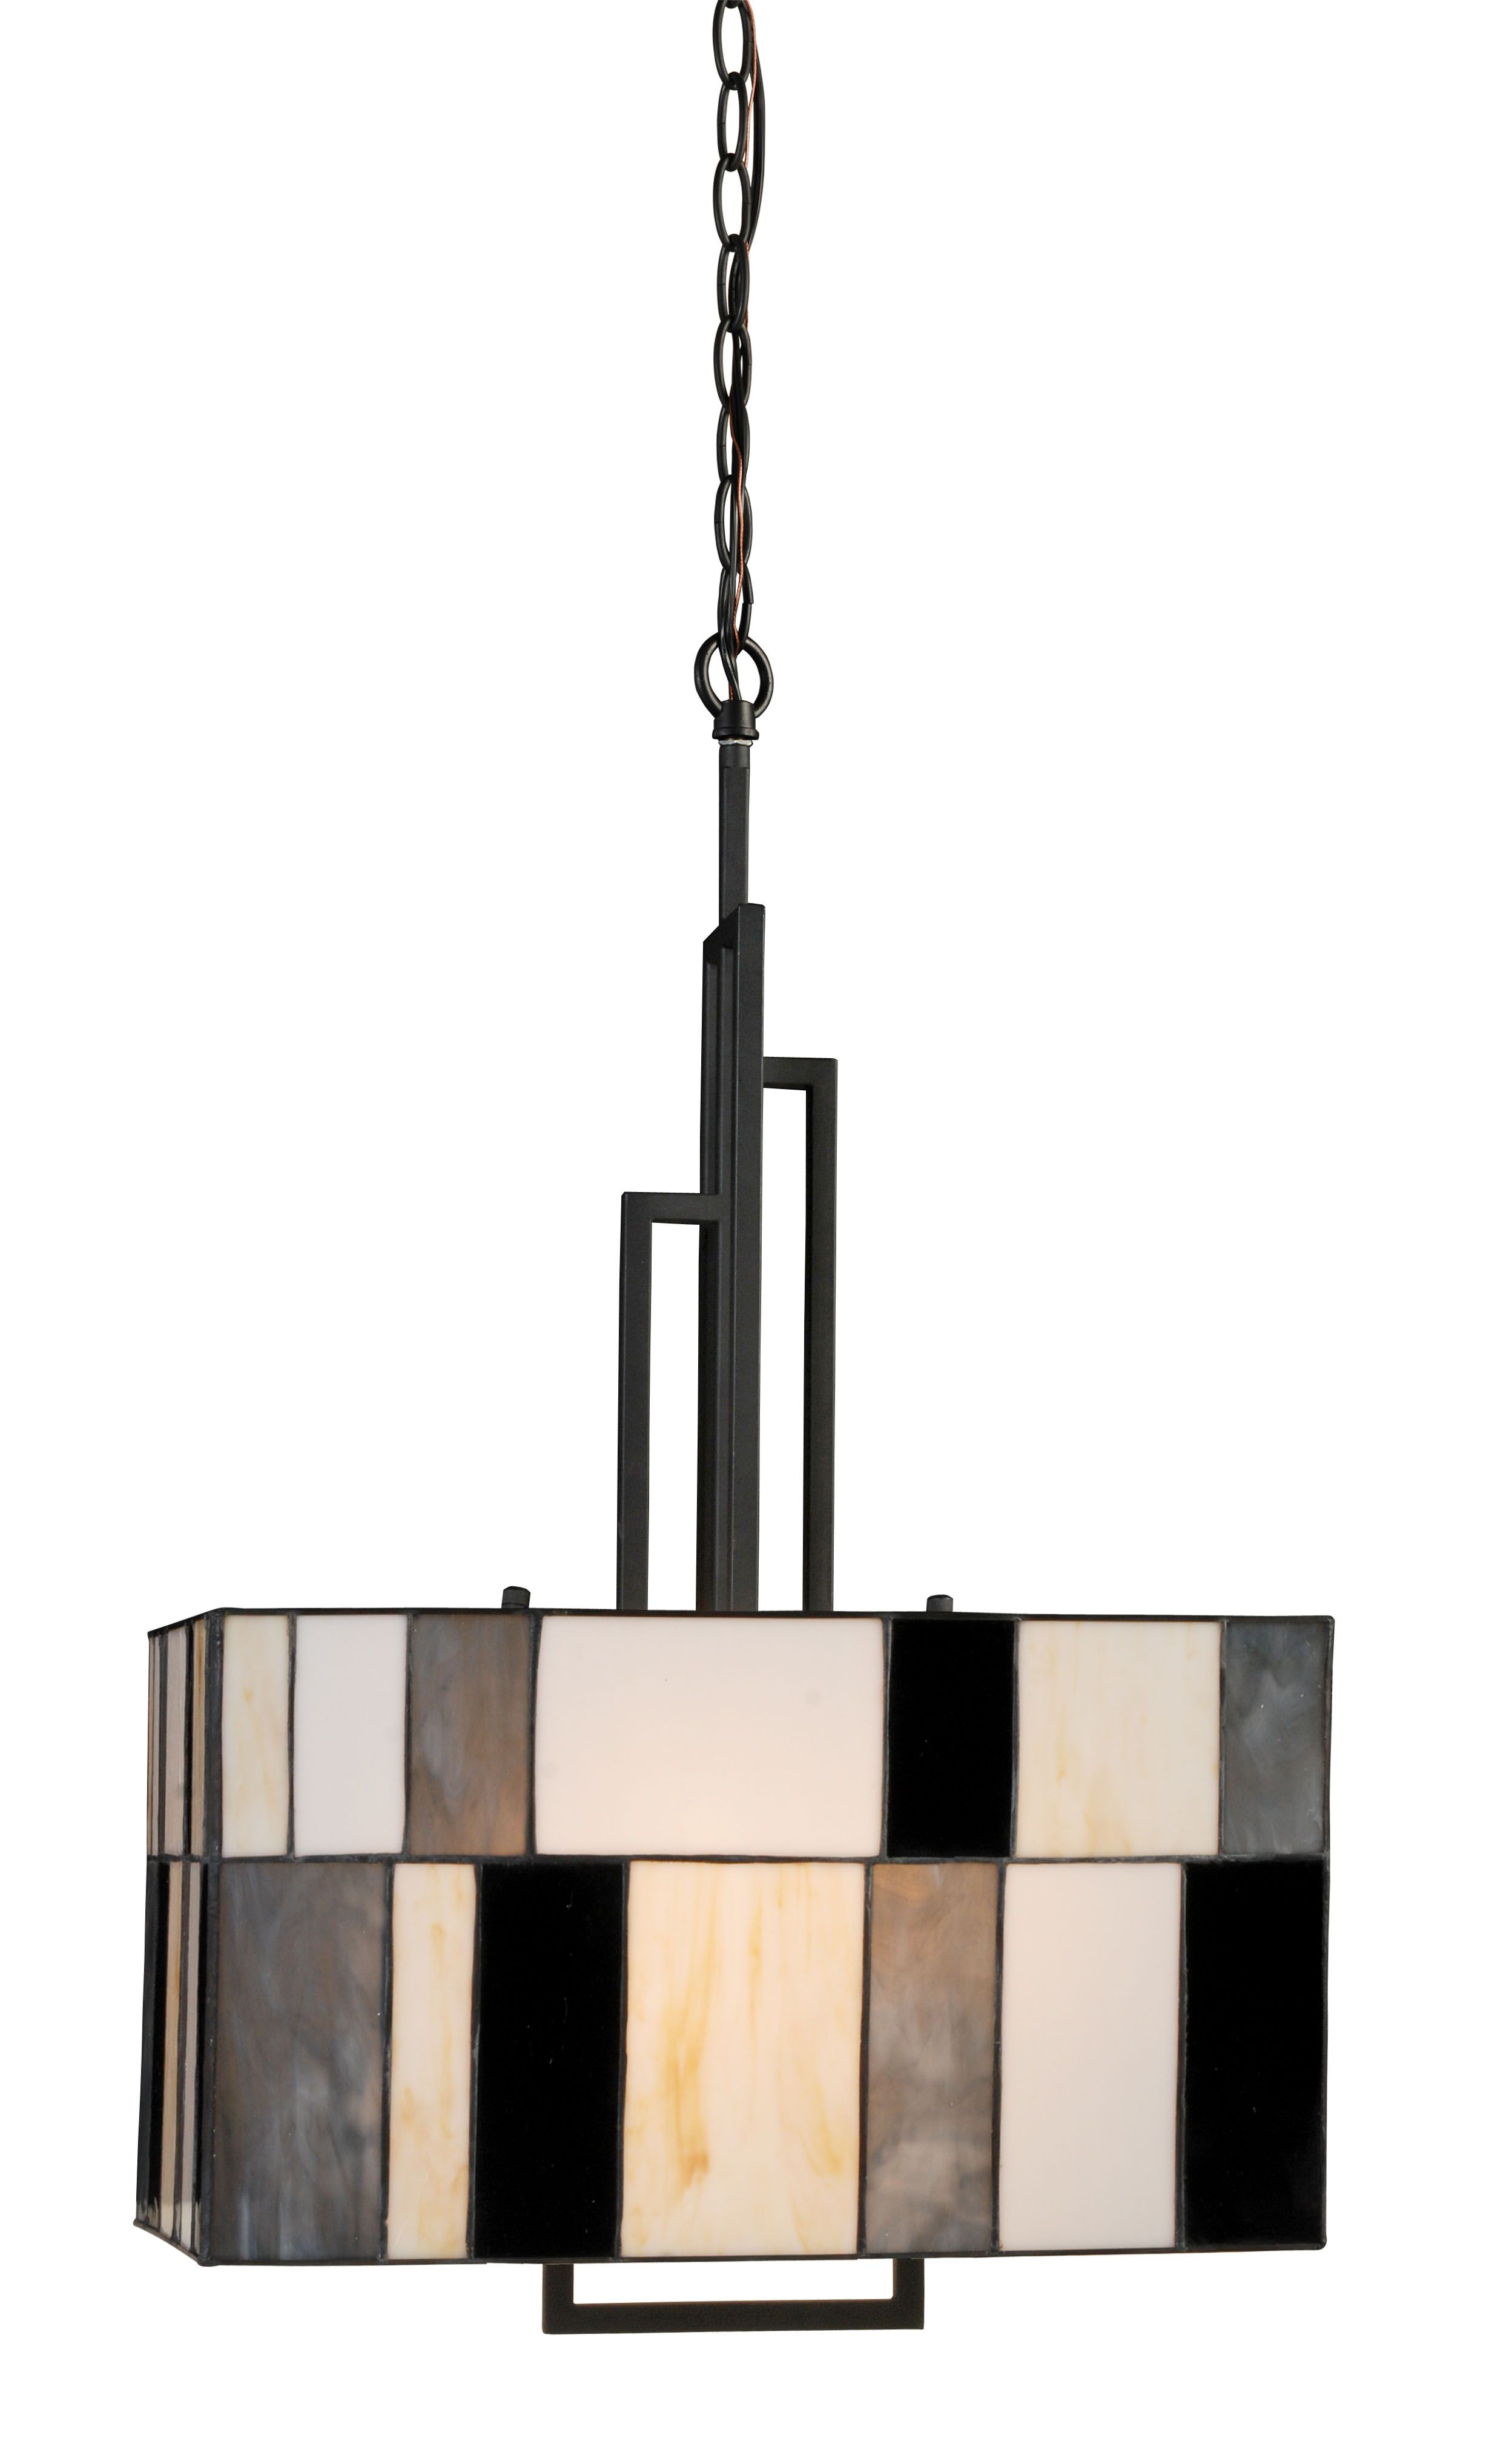 Arte nuovo pendant rona lighting ideas pinterest tiffany arte nuovo pendant rona arubaitofo Choice Image